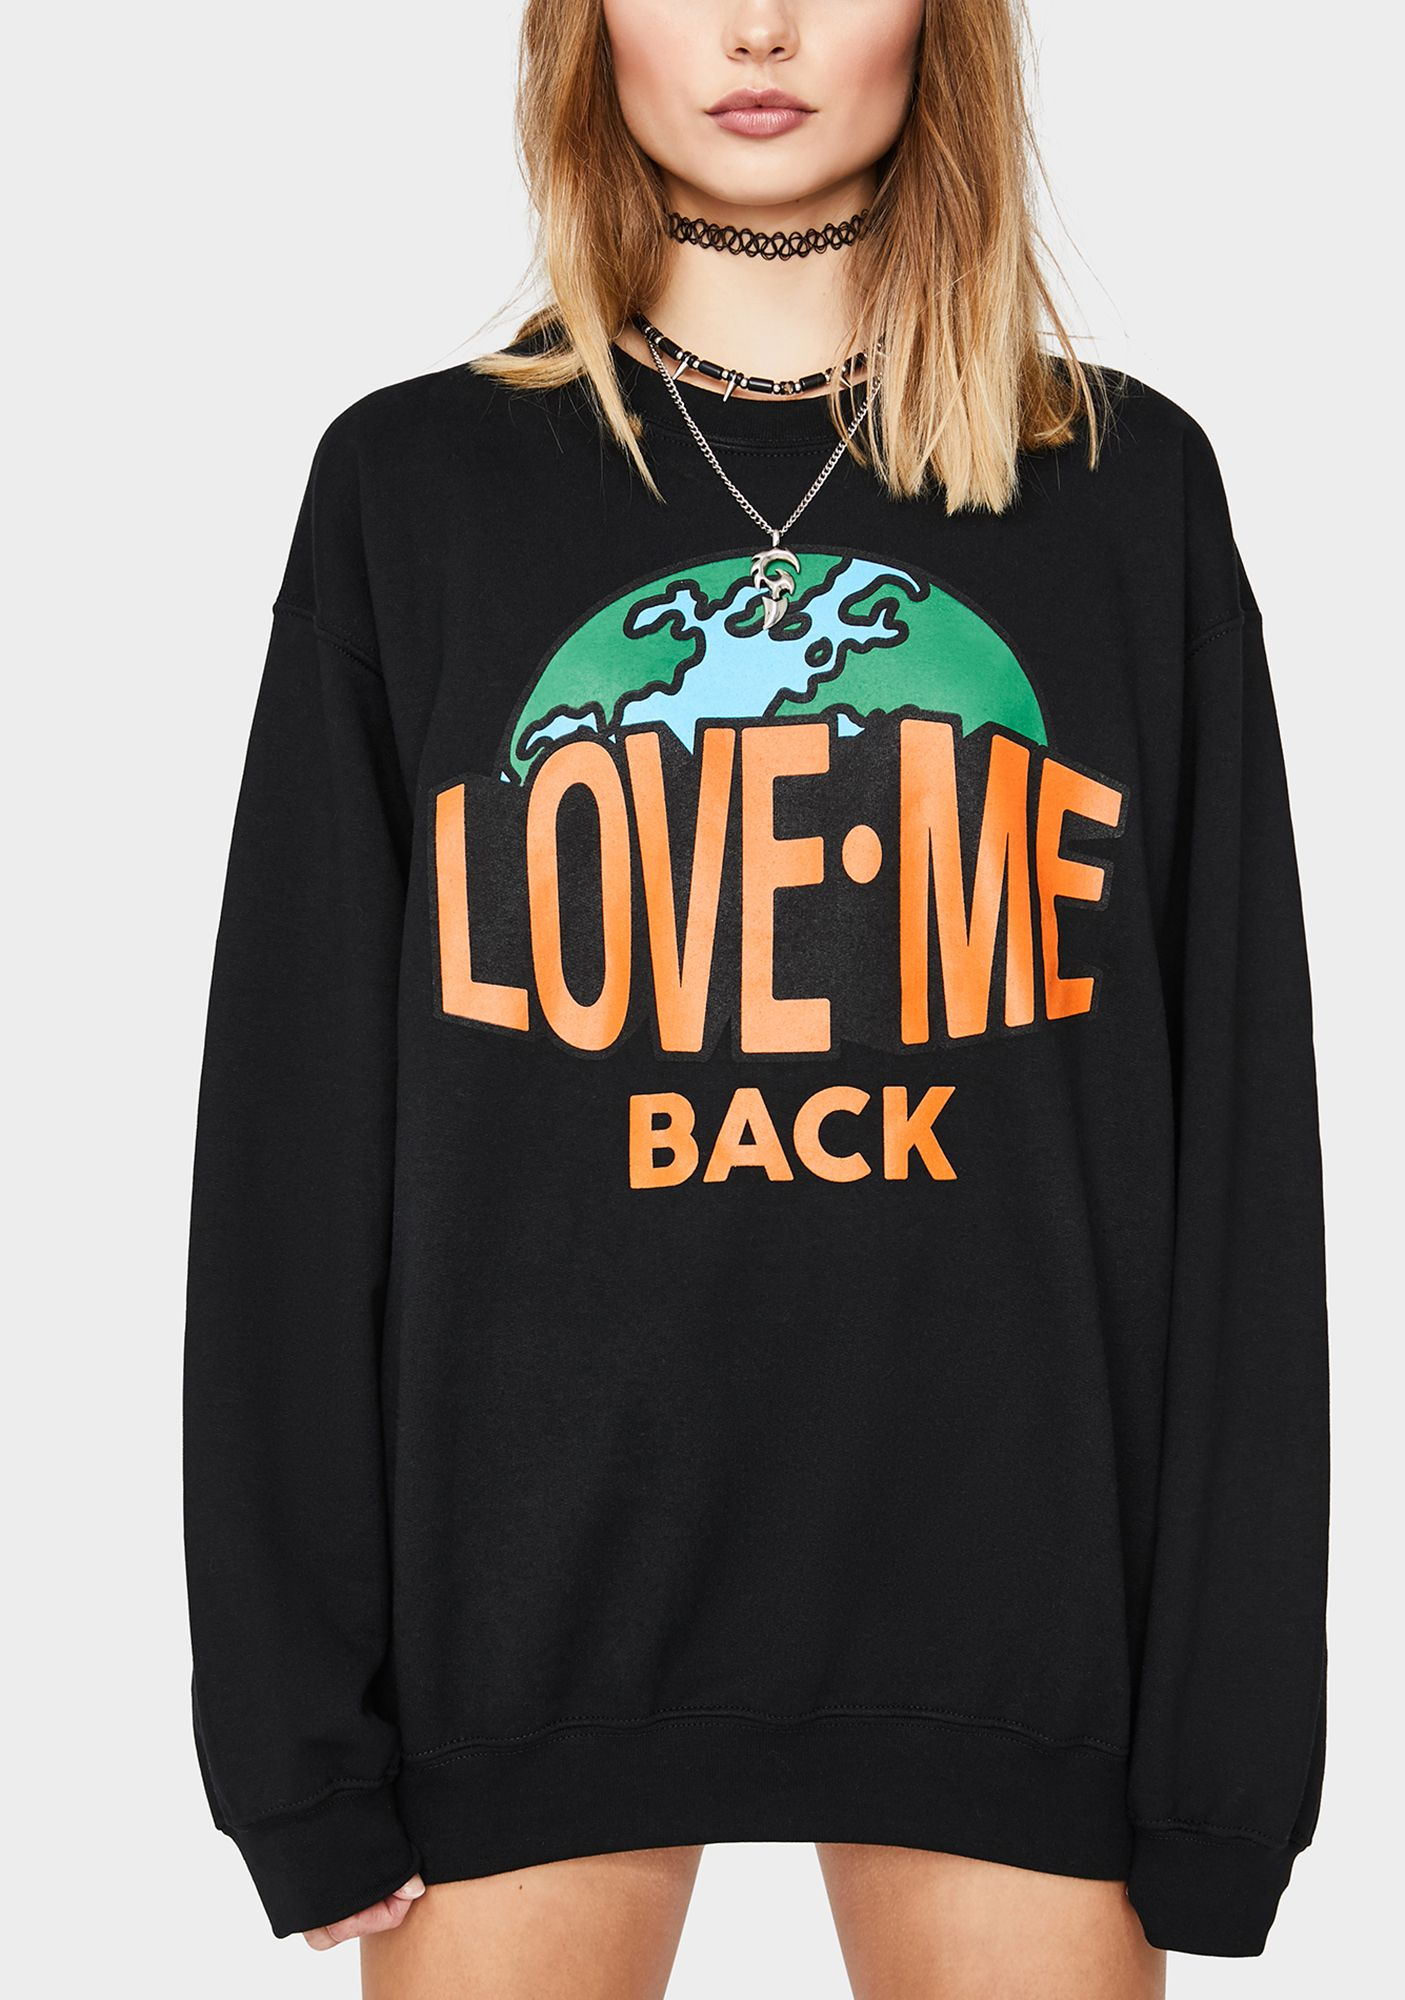 Love Me Back Crewneck Sweatshirt In 2021 Sweatshirts Crew Neck Sweatshirt Black Sweatshirts [ 2000 x 1405 Pixel ]